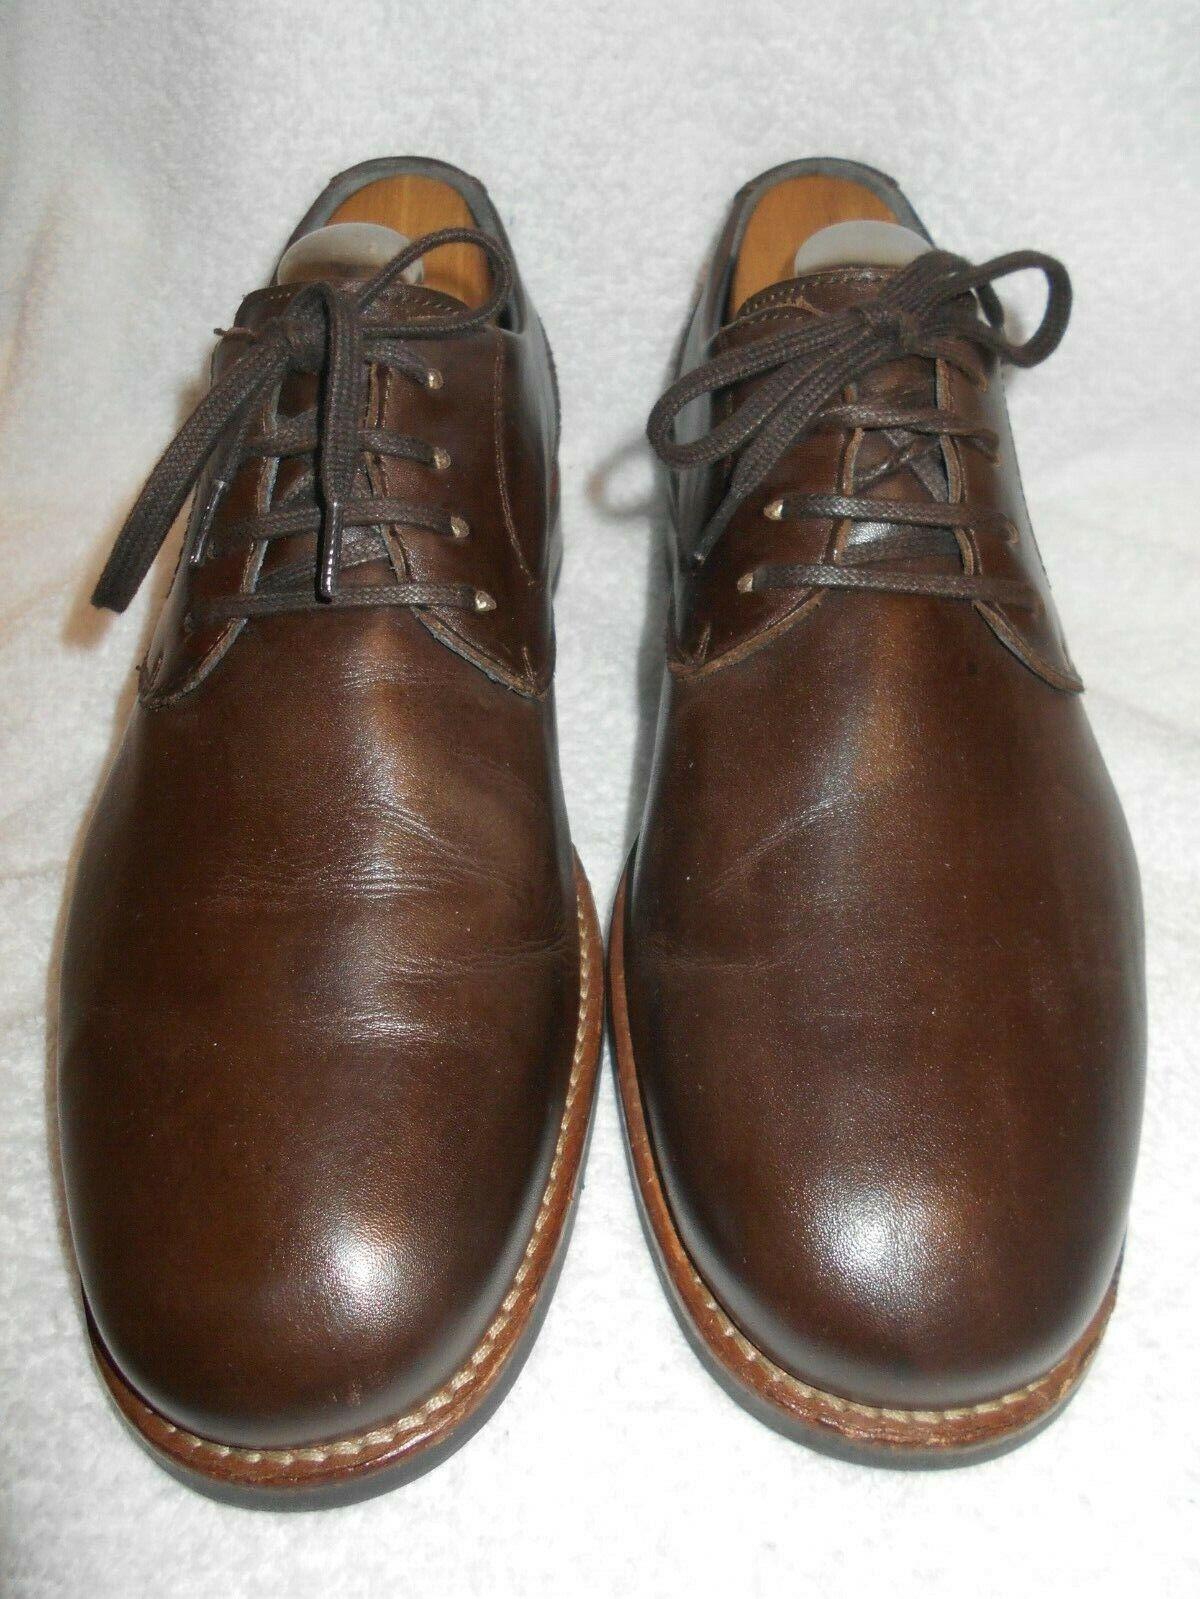 Near Mint Cloud9 W/ New 45 Samuel Hubbard Insoles Brown Plain Toe Oxfords 10 - $54.50